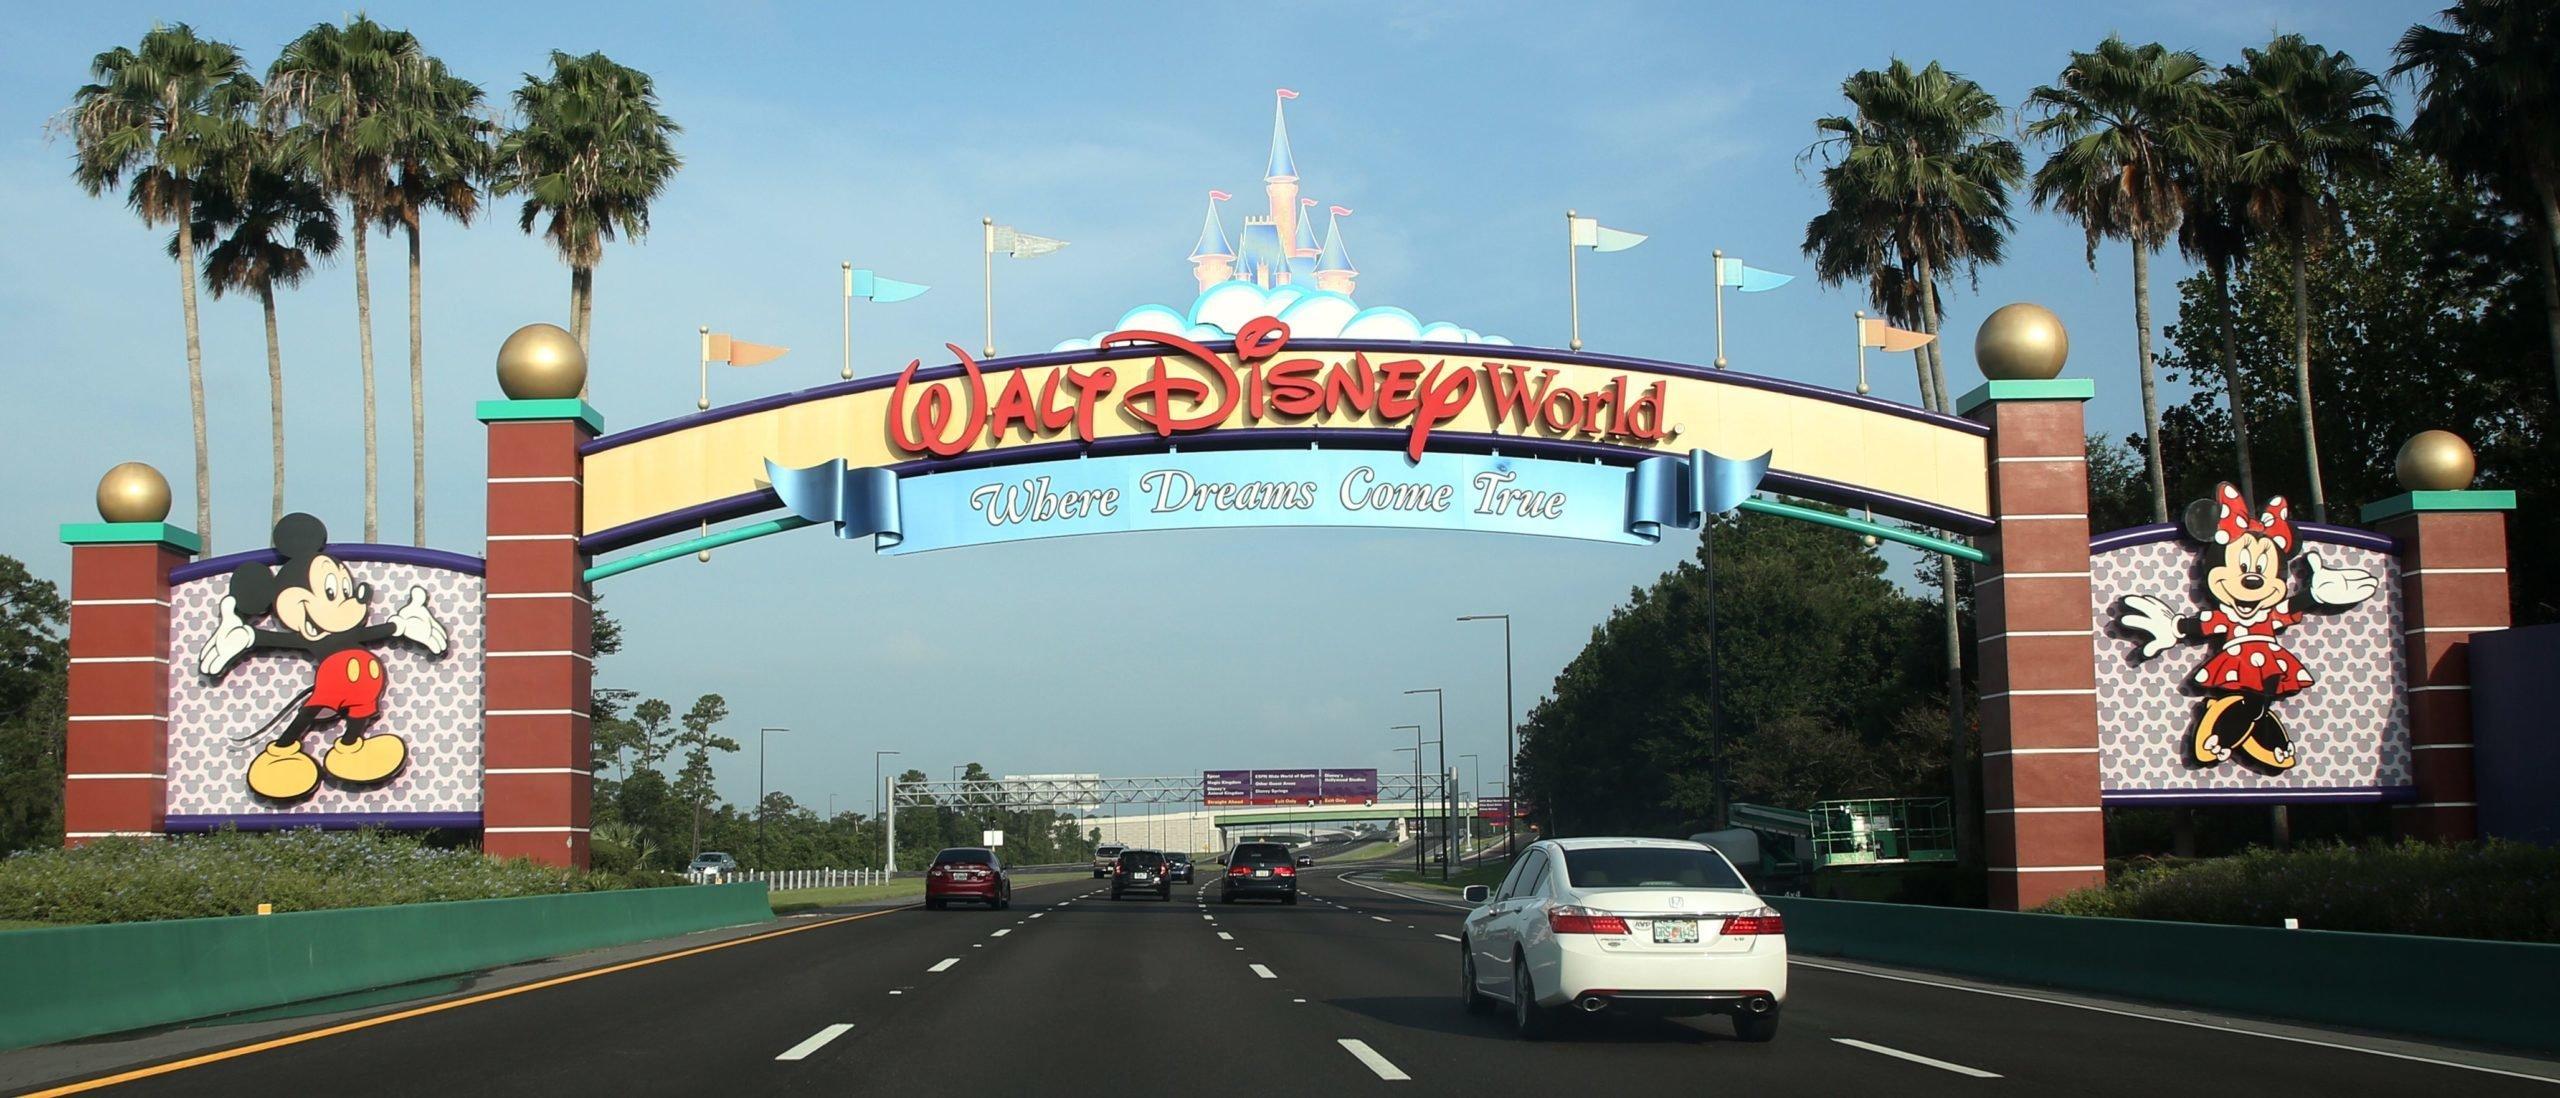 Disney to lay off 32,000 workers as coronavirus devastates theme parks 1